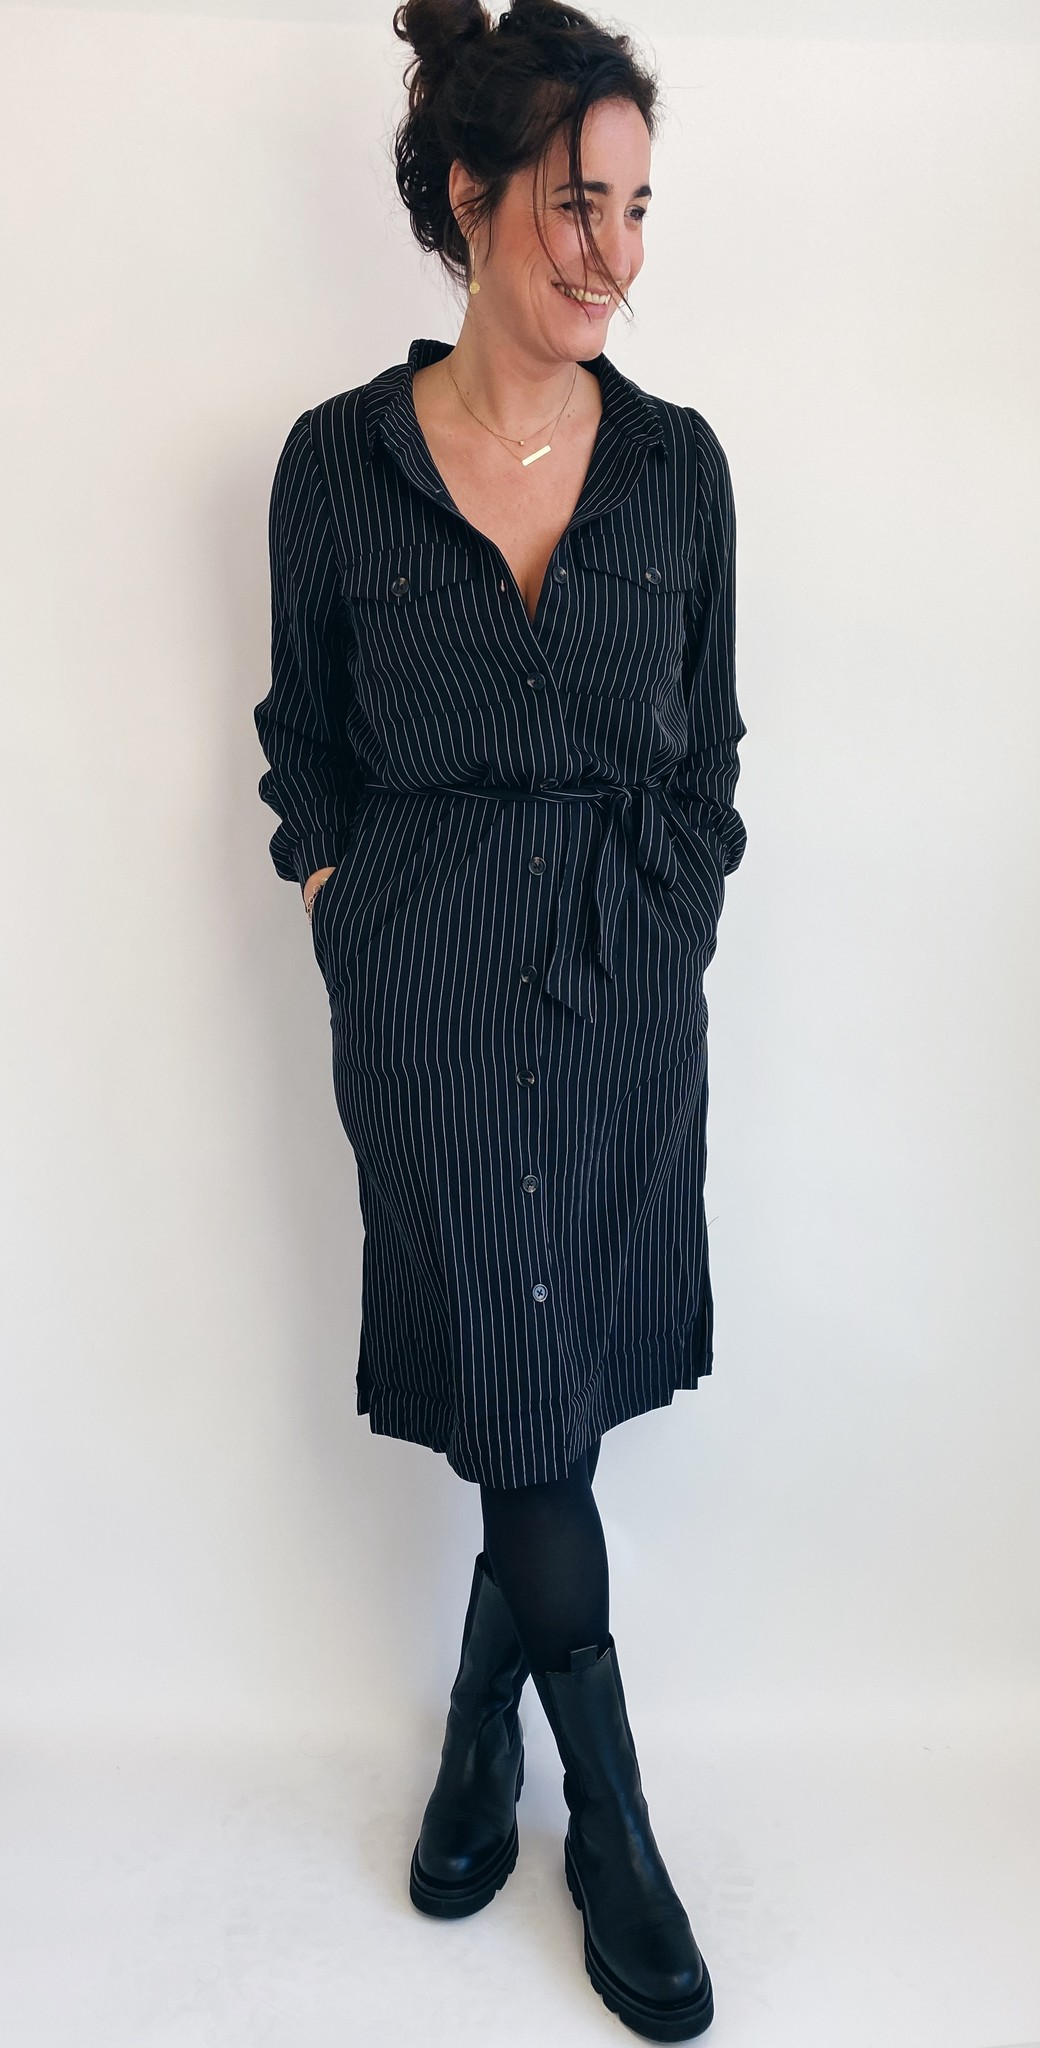 Jurk kagaye shirt dress black pinstripe-1